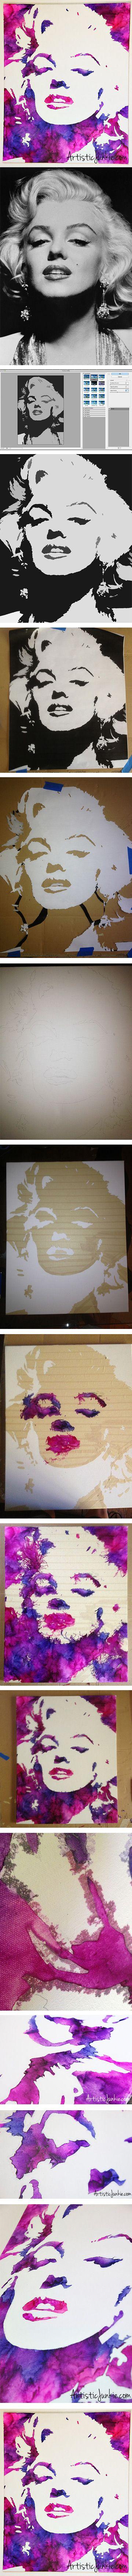 Marilyn Monroe DIY Crayon Art Tutorial & Art.